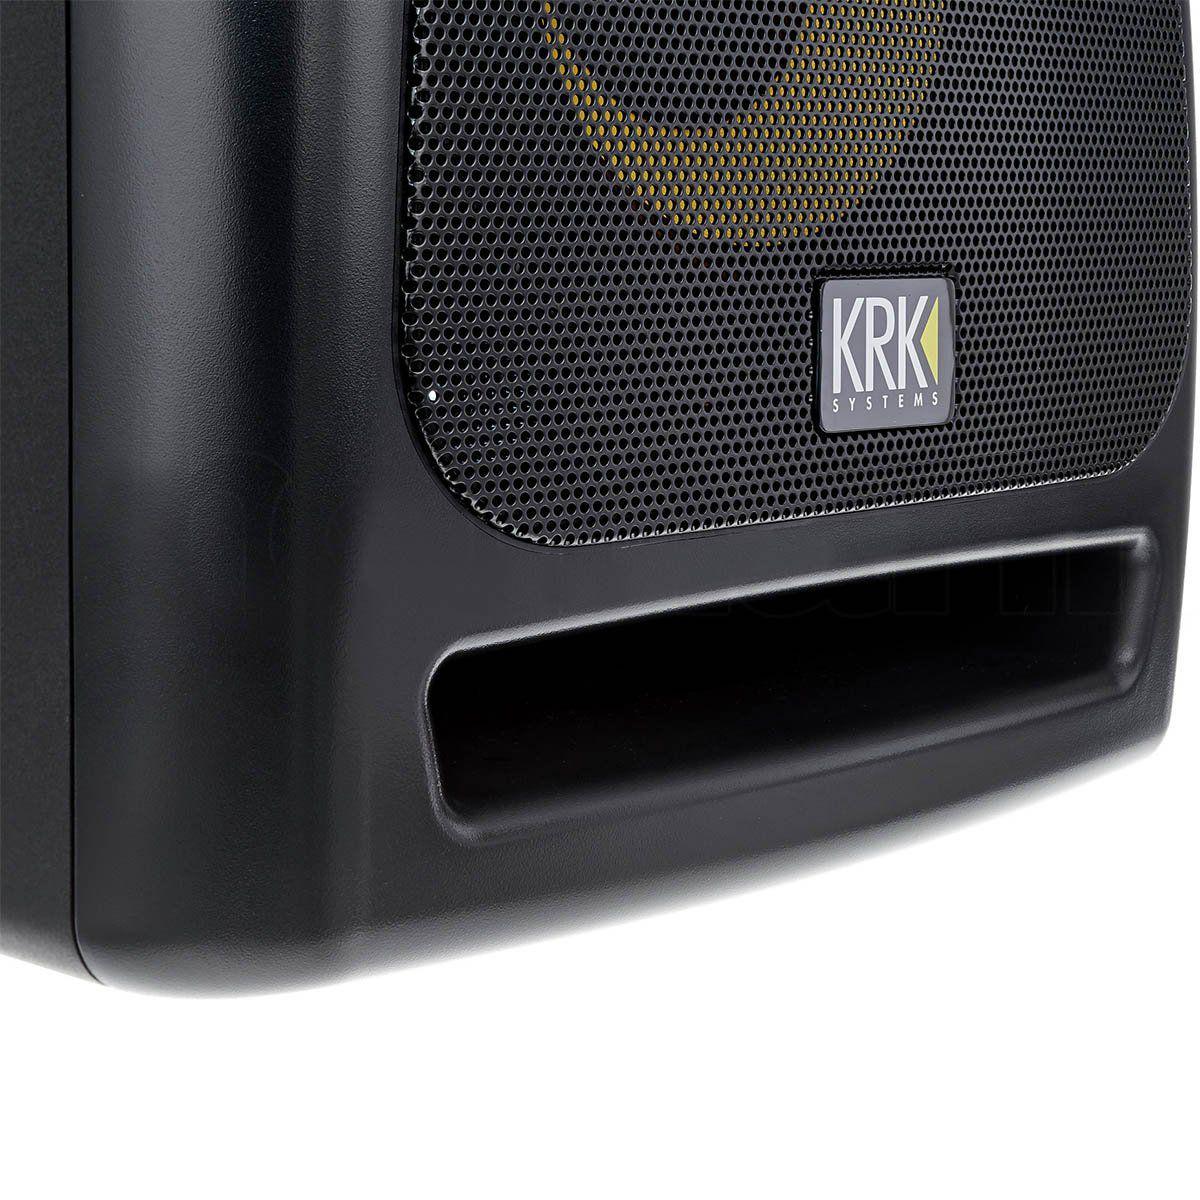 Krk RP12S Monitor de Áudio Subwoofer Krk RP12S Rokit Powered Estúdio